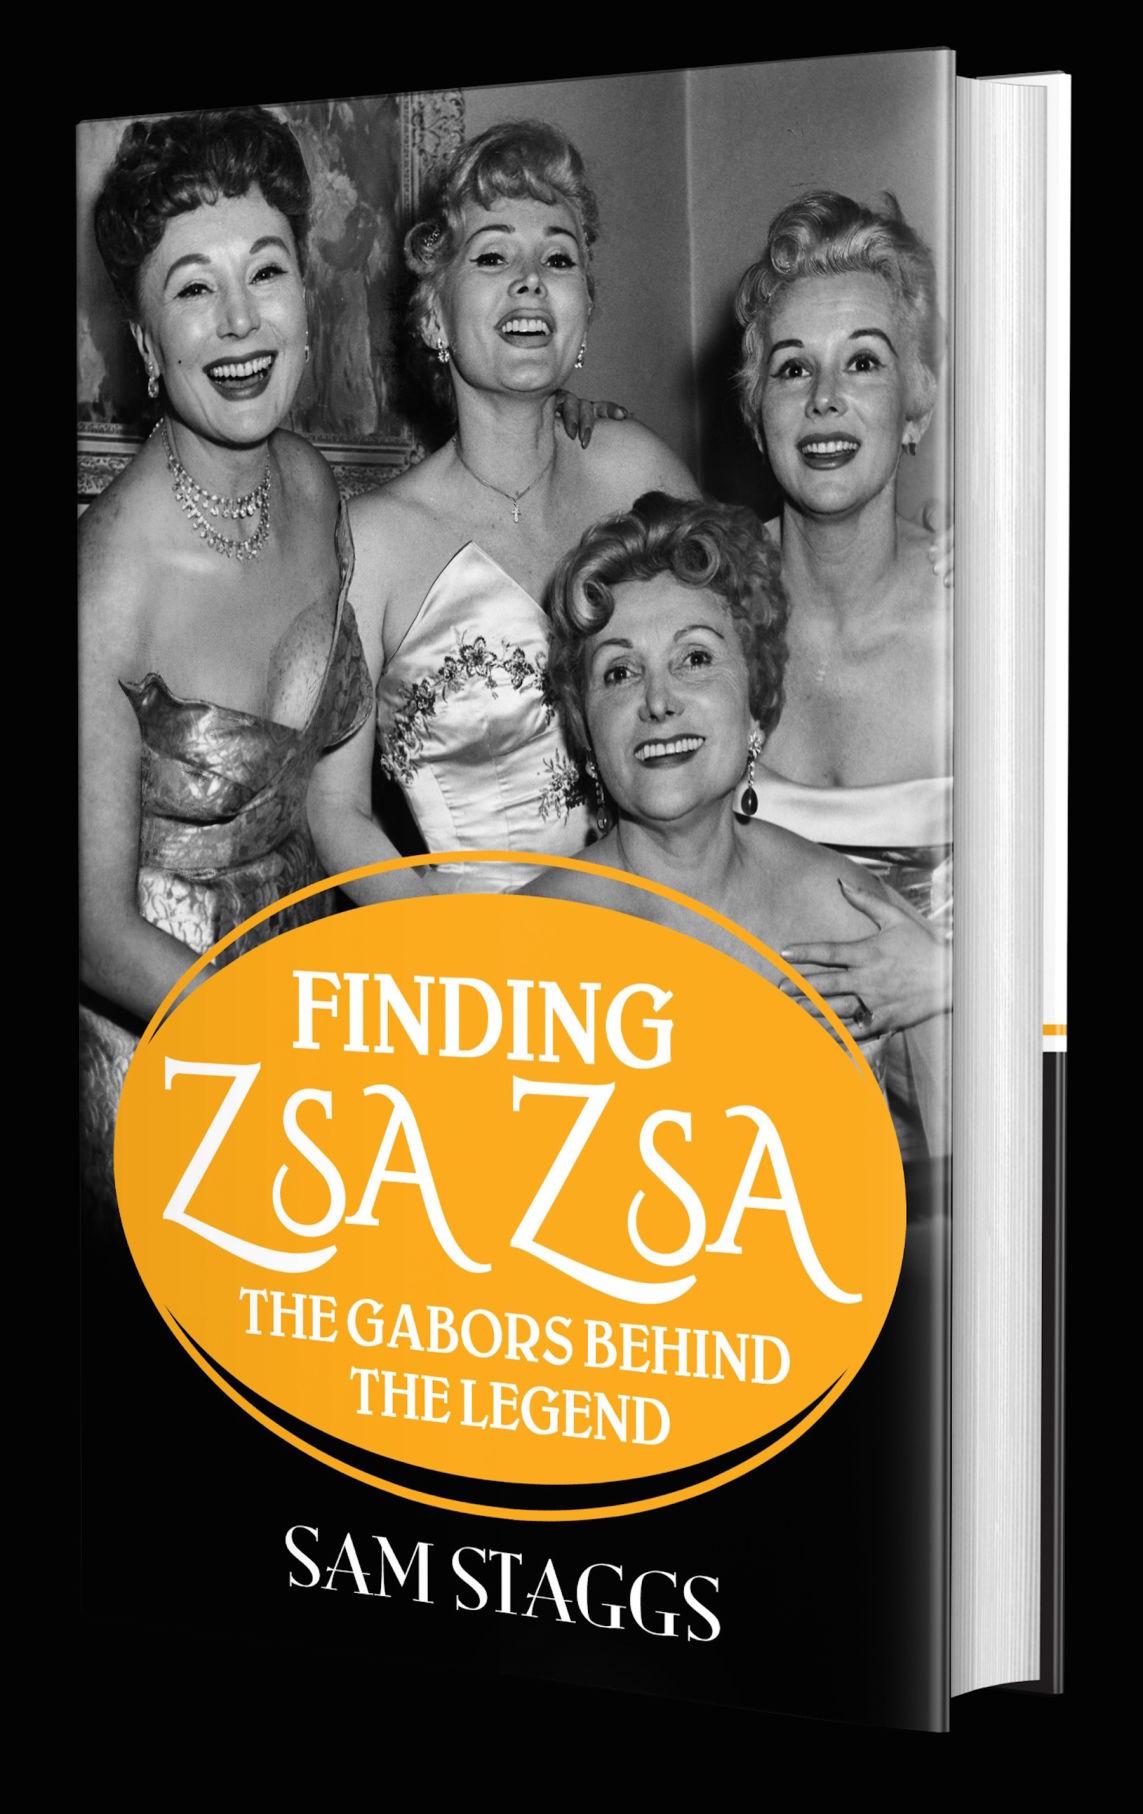 Finding Zsa Zsa version 2.jpg